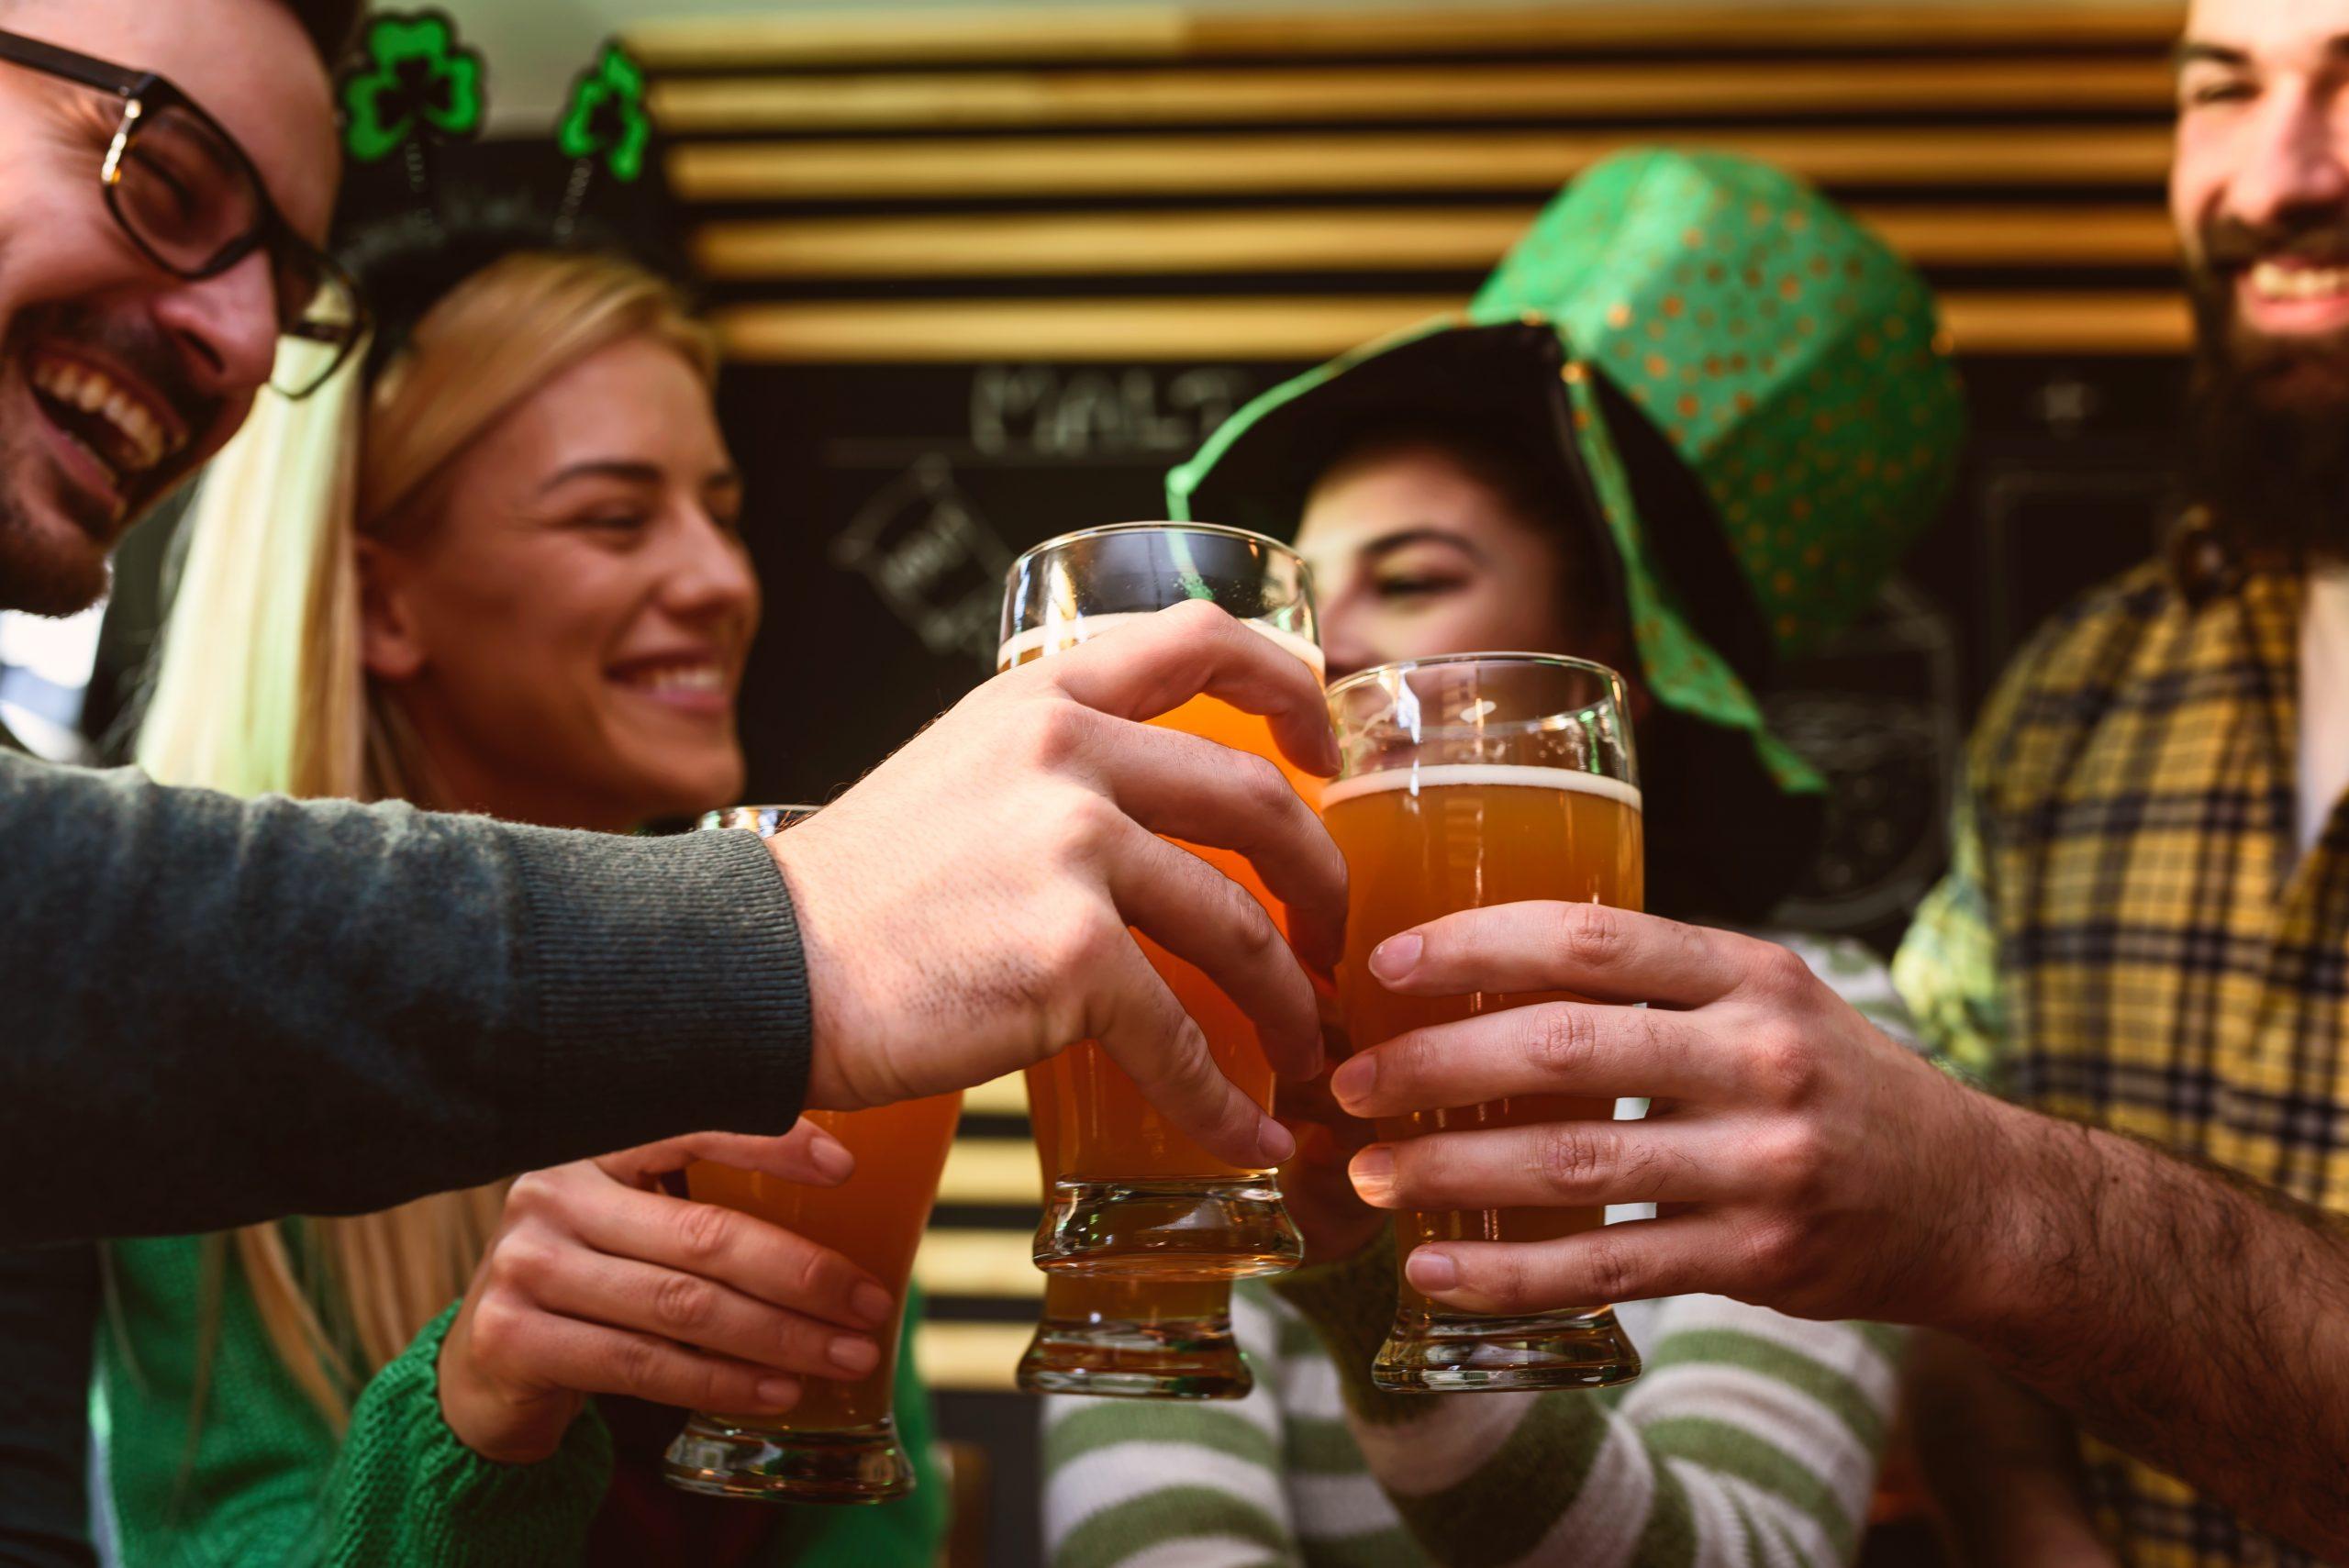 St. Patricks Day in Wilmington, DE